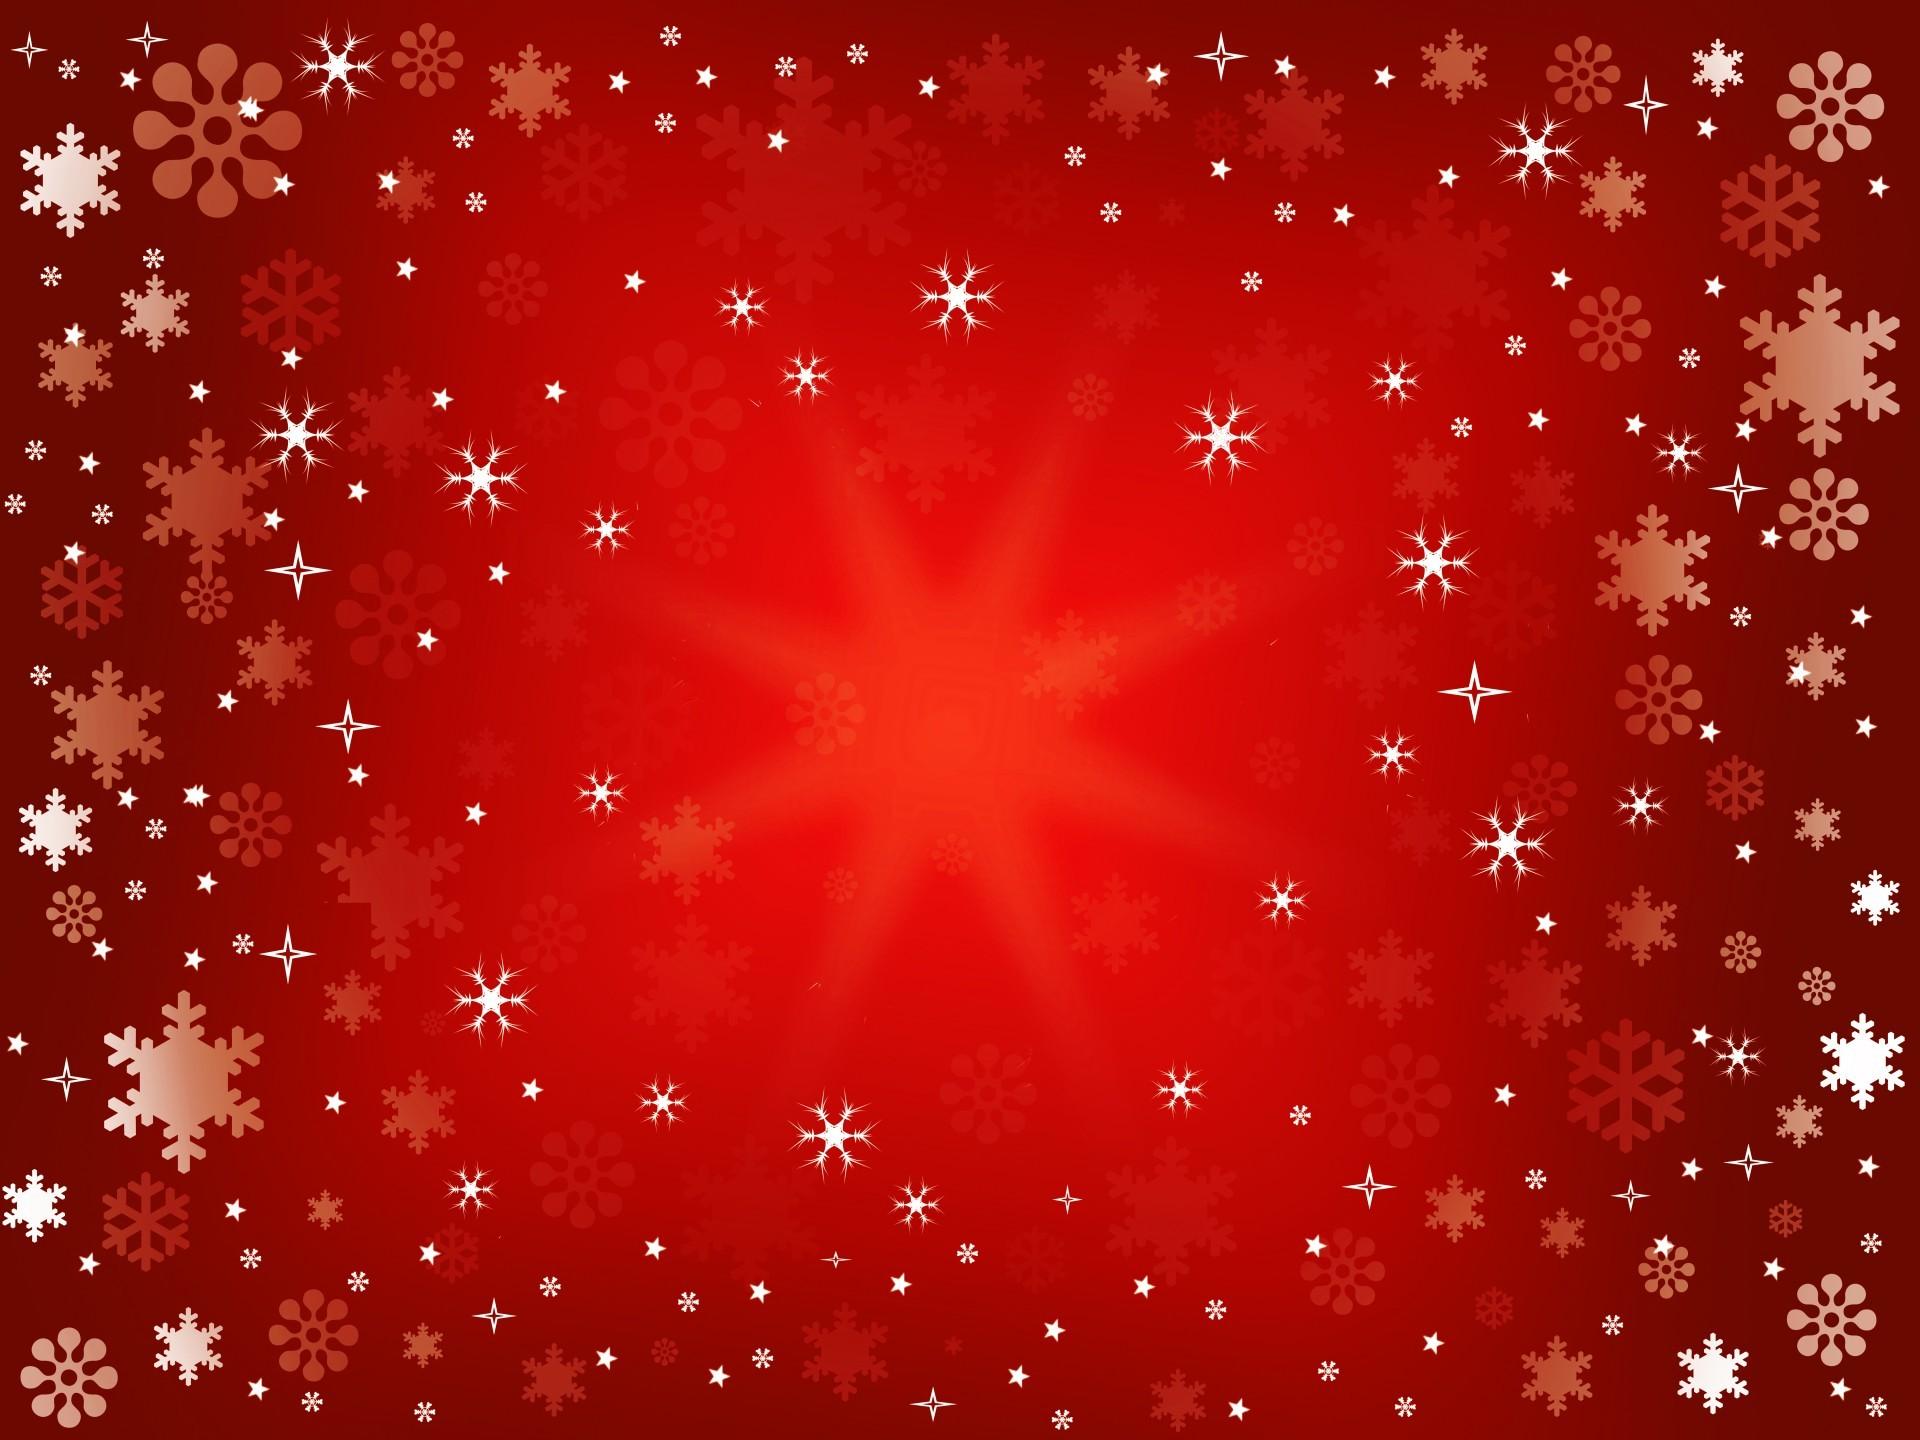 X Animated Christmas Backgrounds